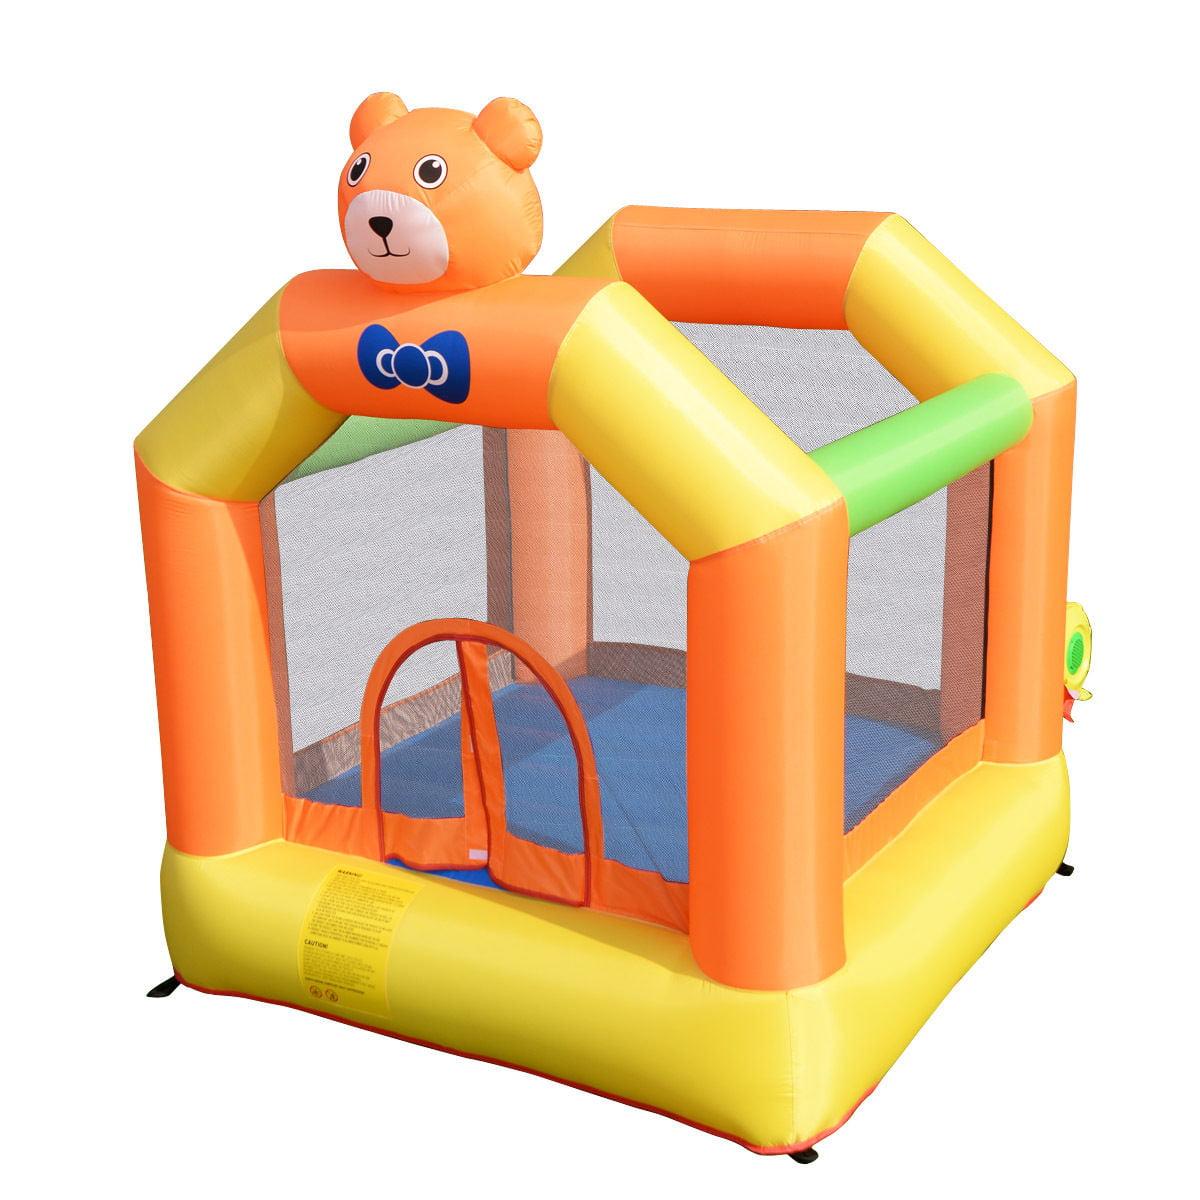 Costway Inflatable Little Bear Bounce House Jumper Moonwa...